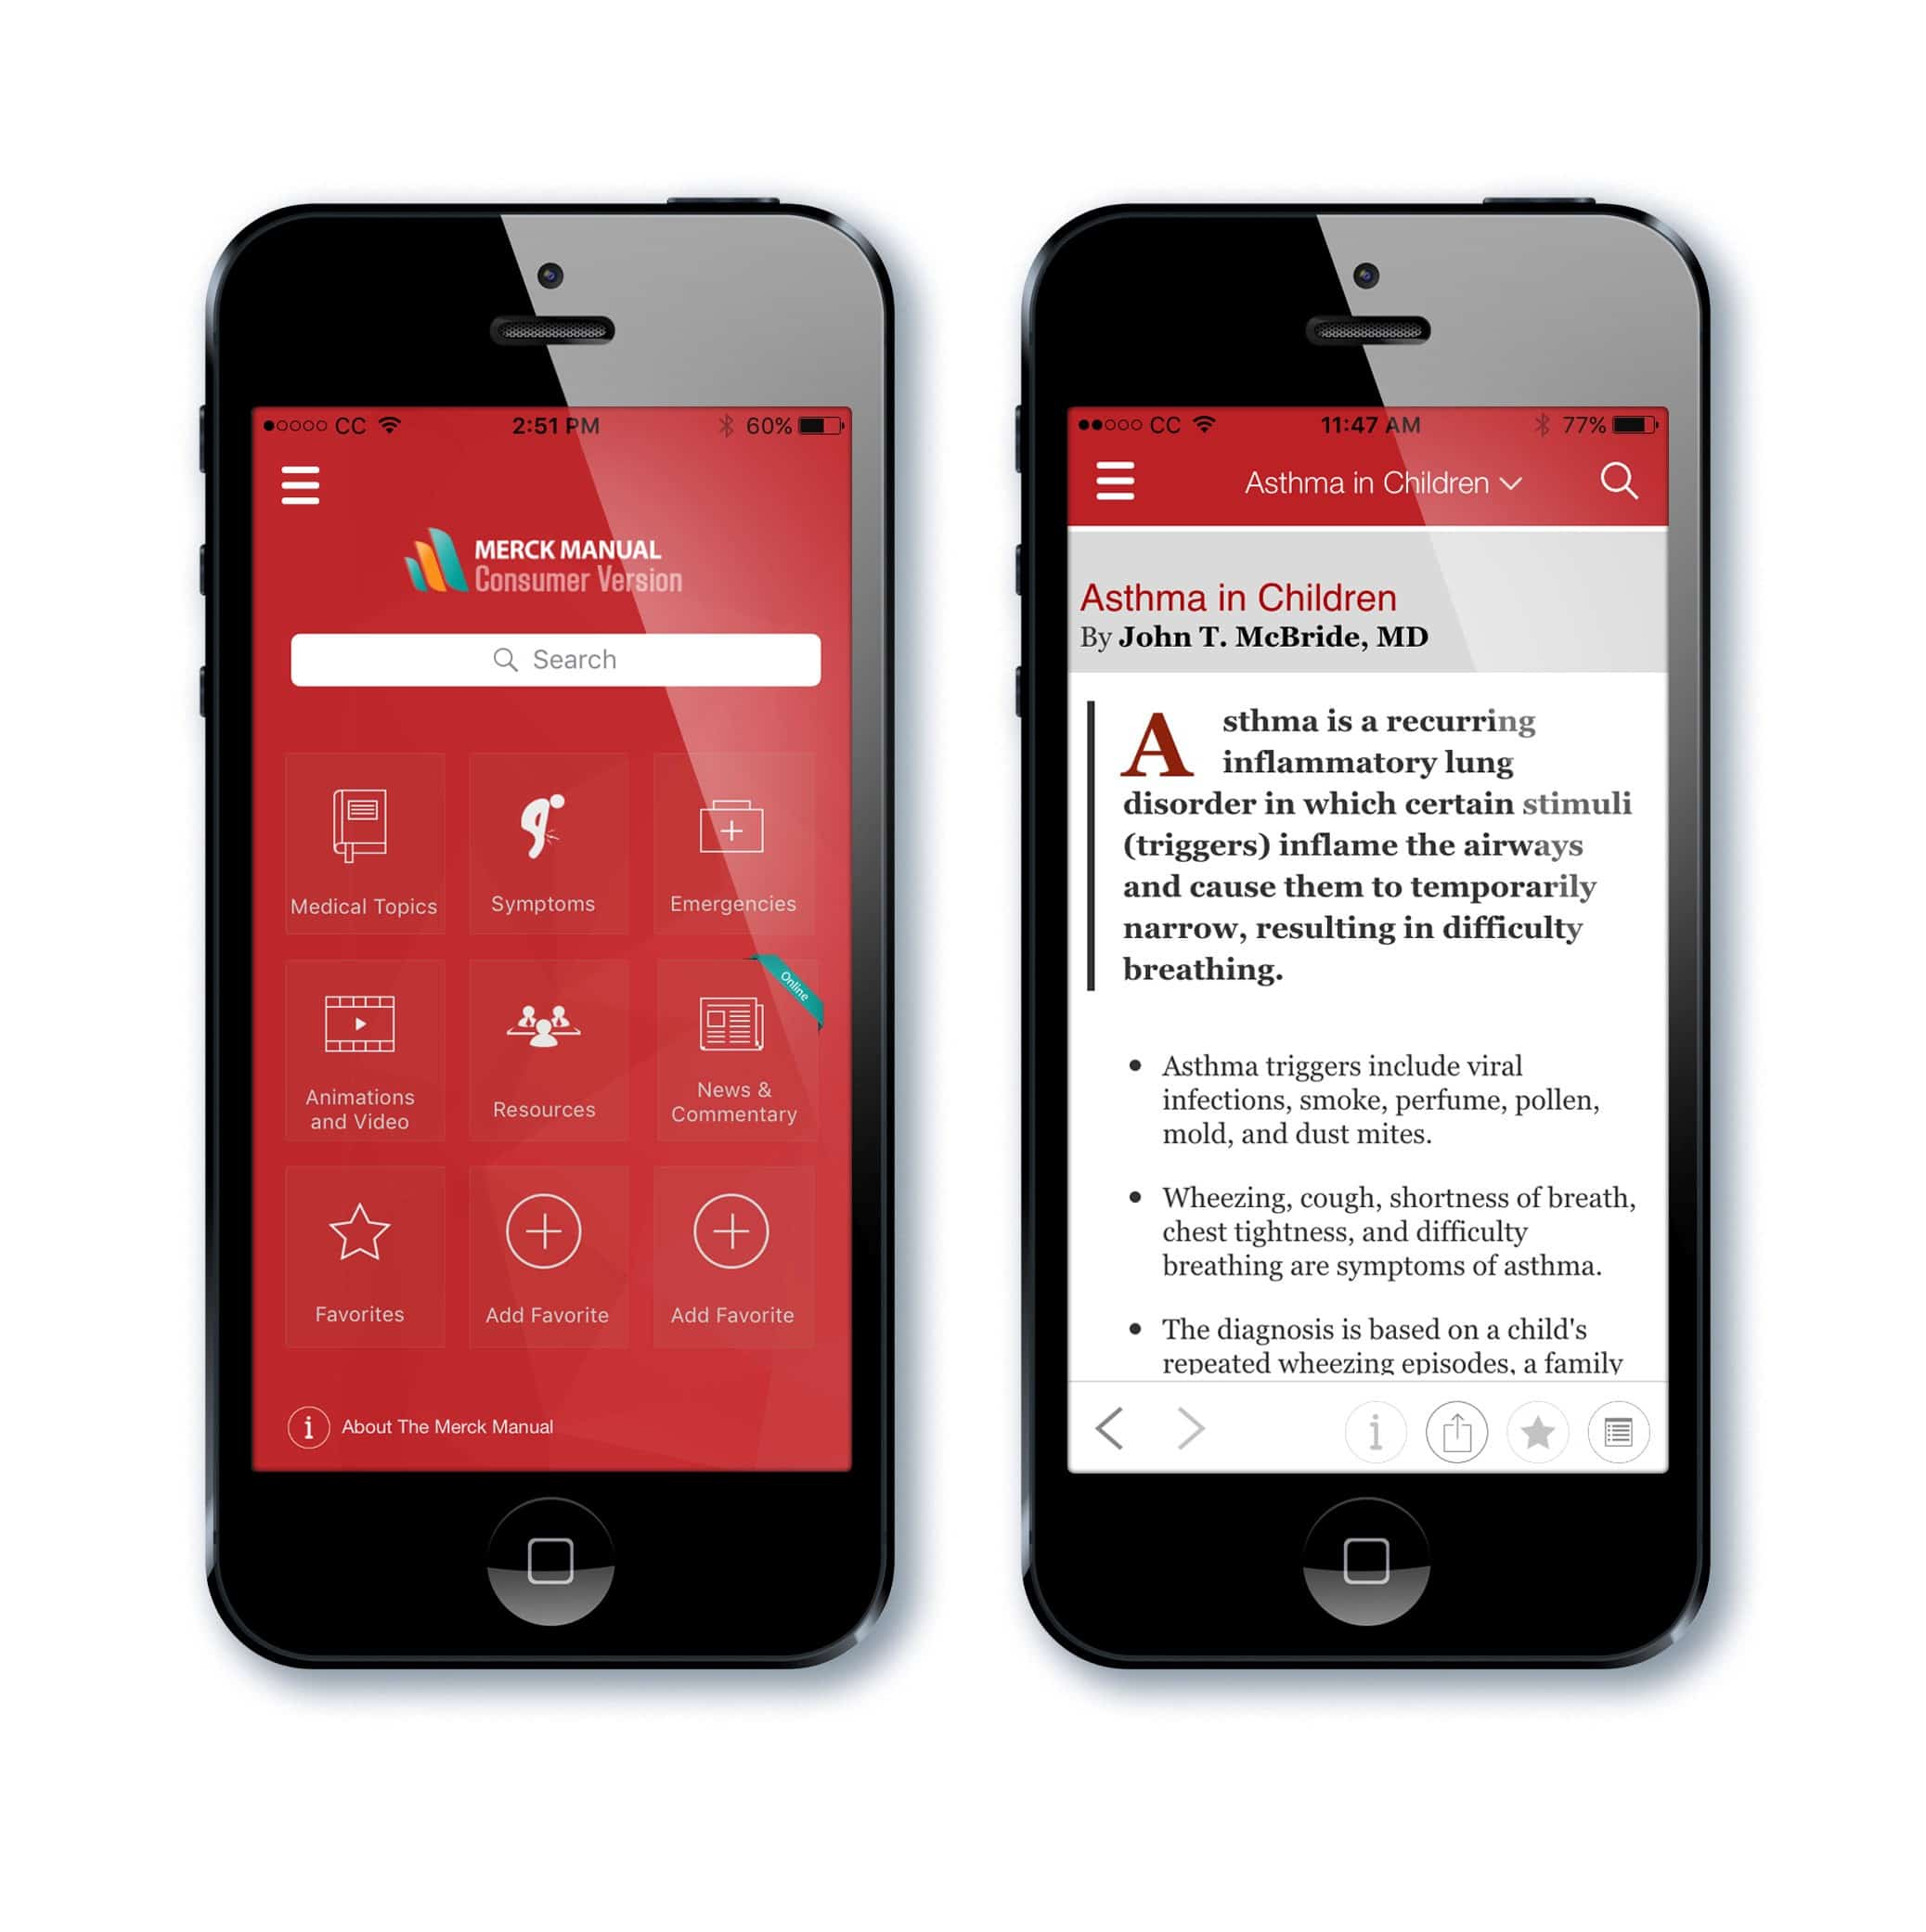 Merk Manual Consumer App